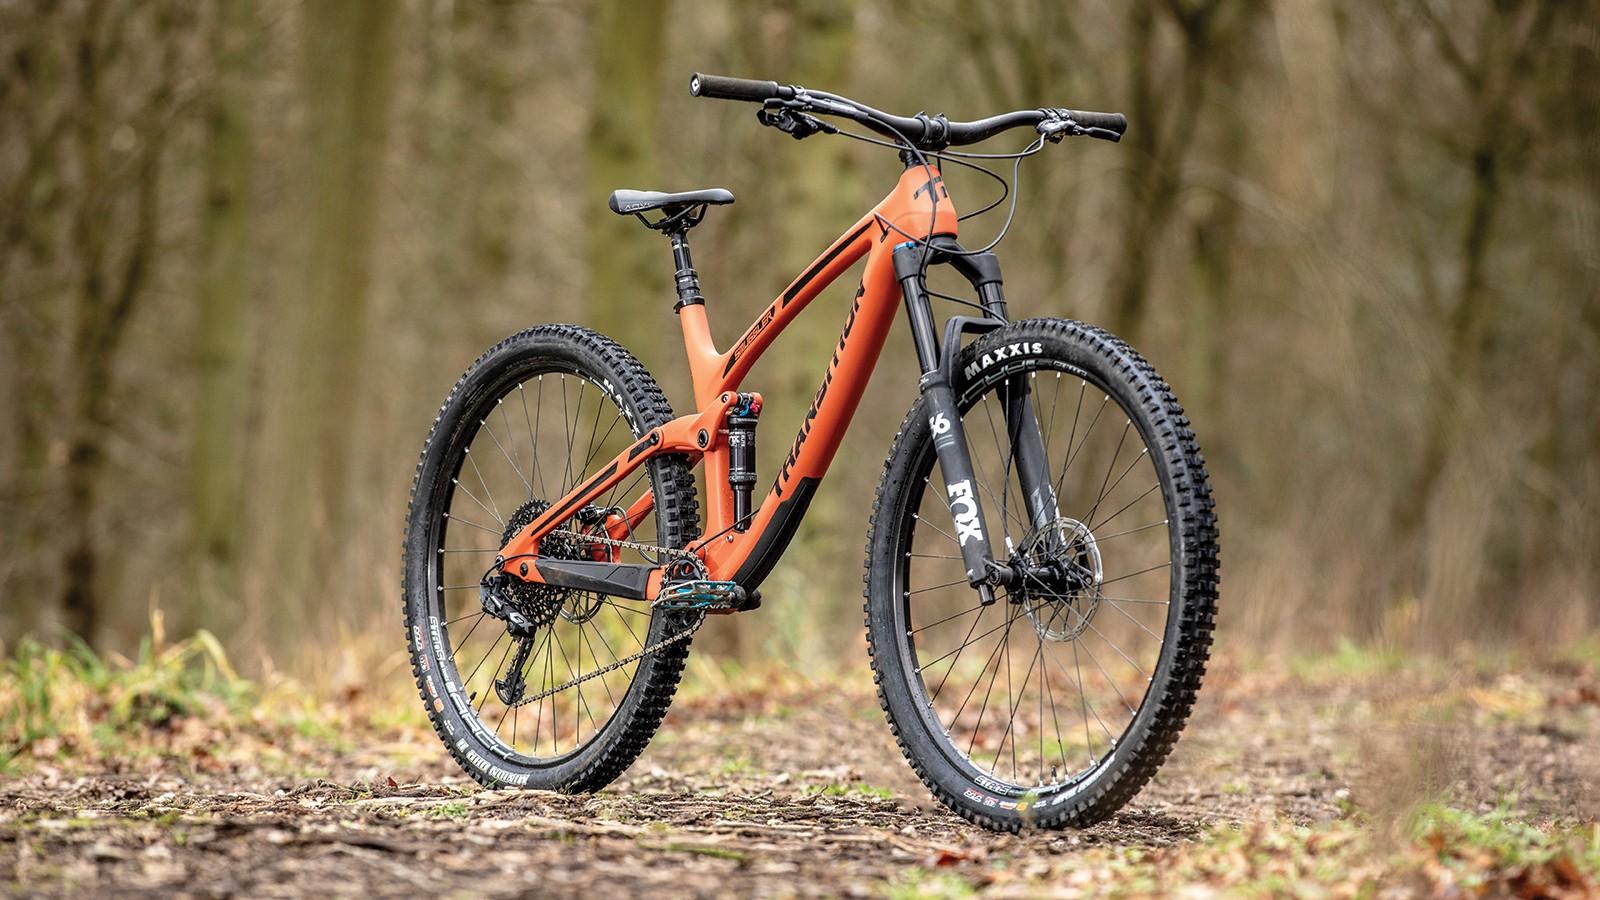 Transition Smuggler GX full suspension mountain bike